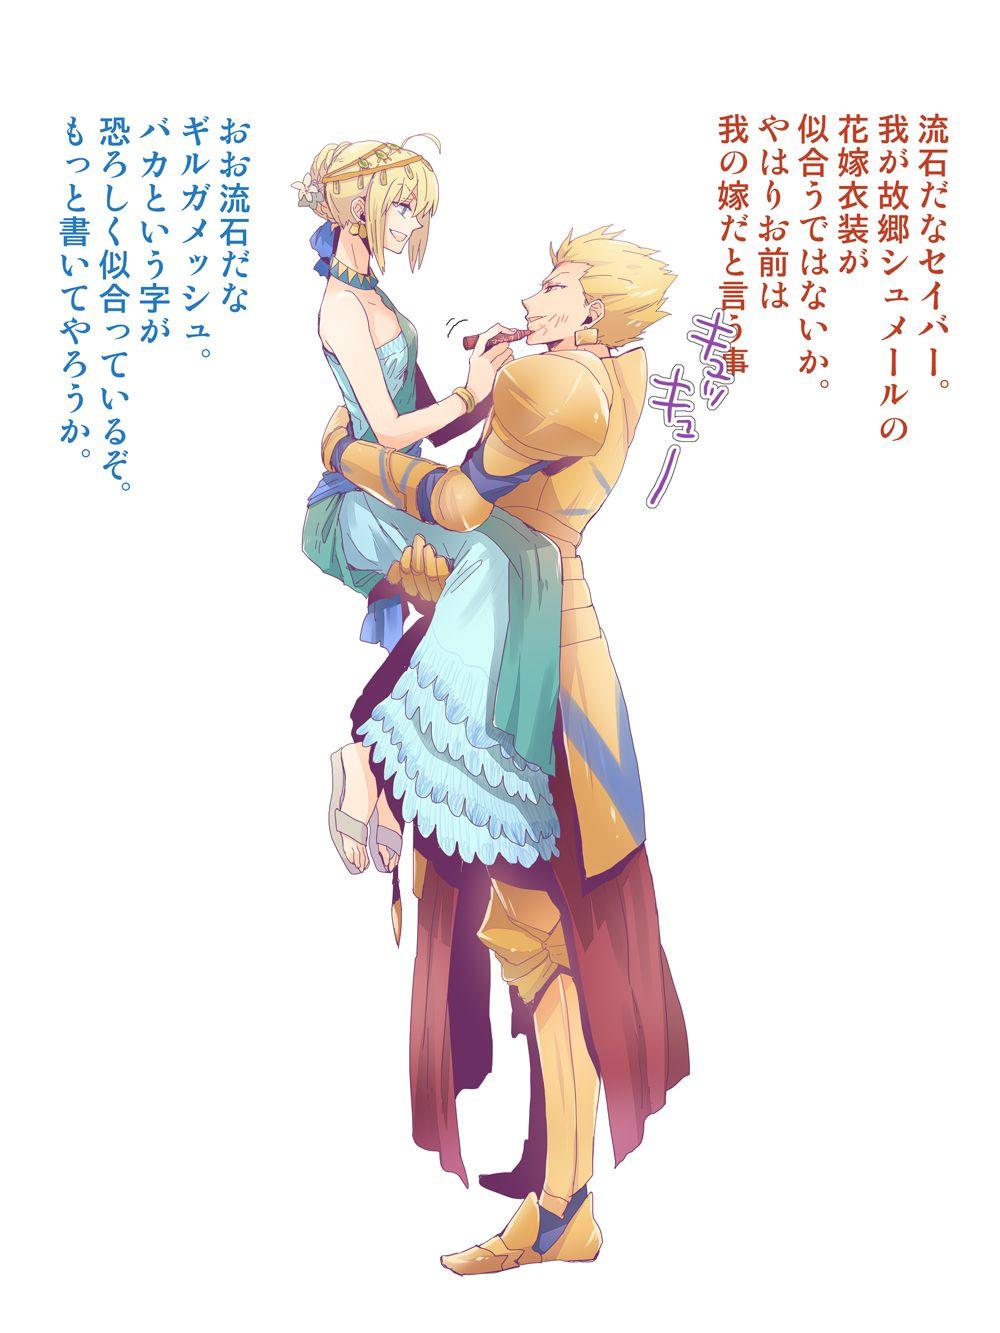 fate zero gilgamesh and saber relationship